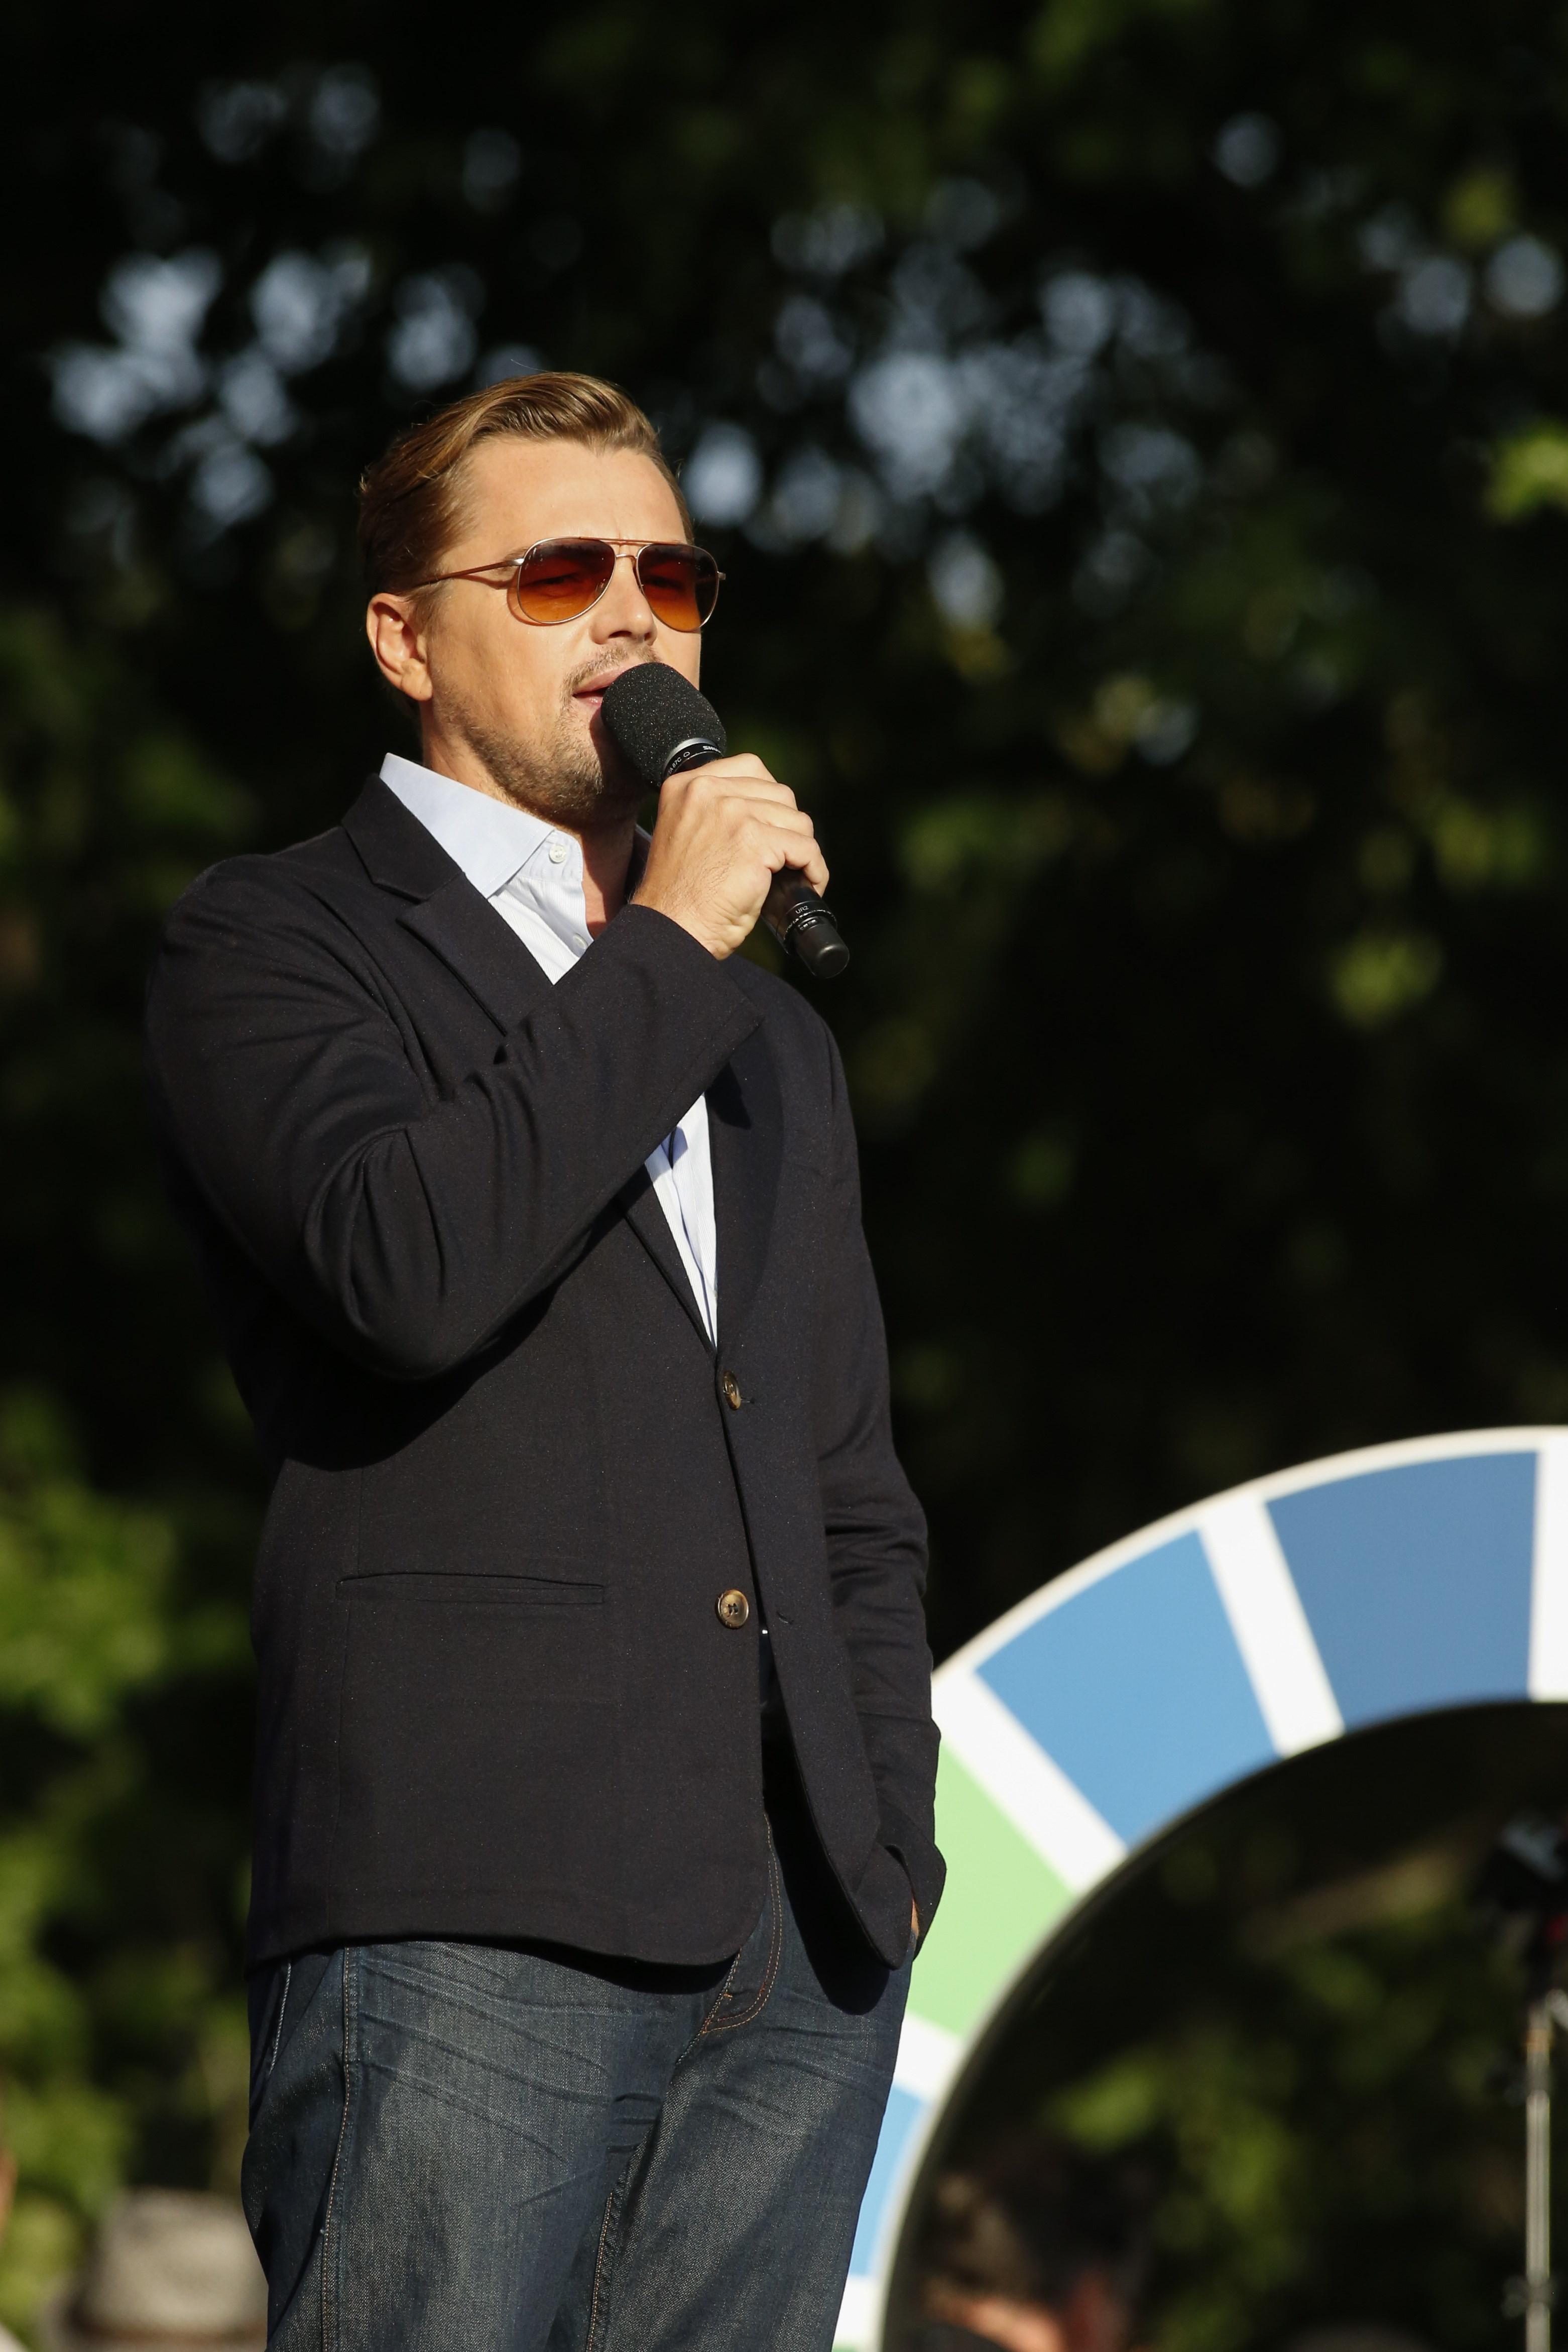 Leonardo DiCaprio attends the fourth annual Global Citizen Festival in Central Park Manhattan in New York on Sept. 26, 2015.